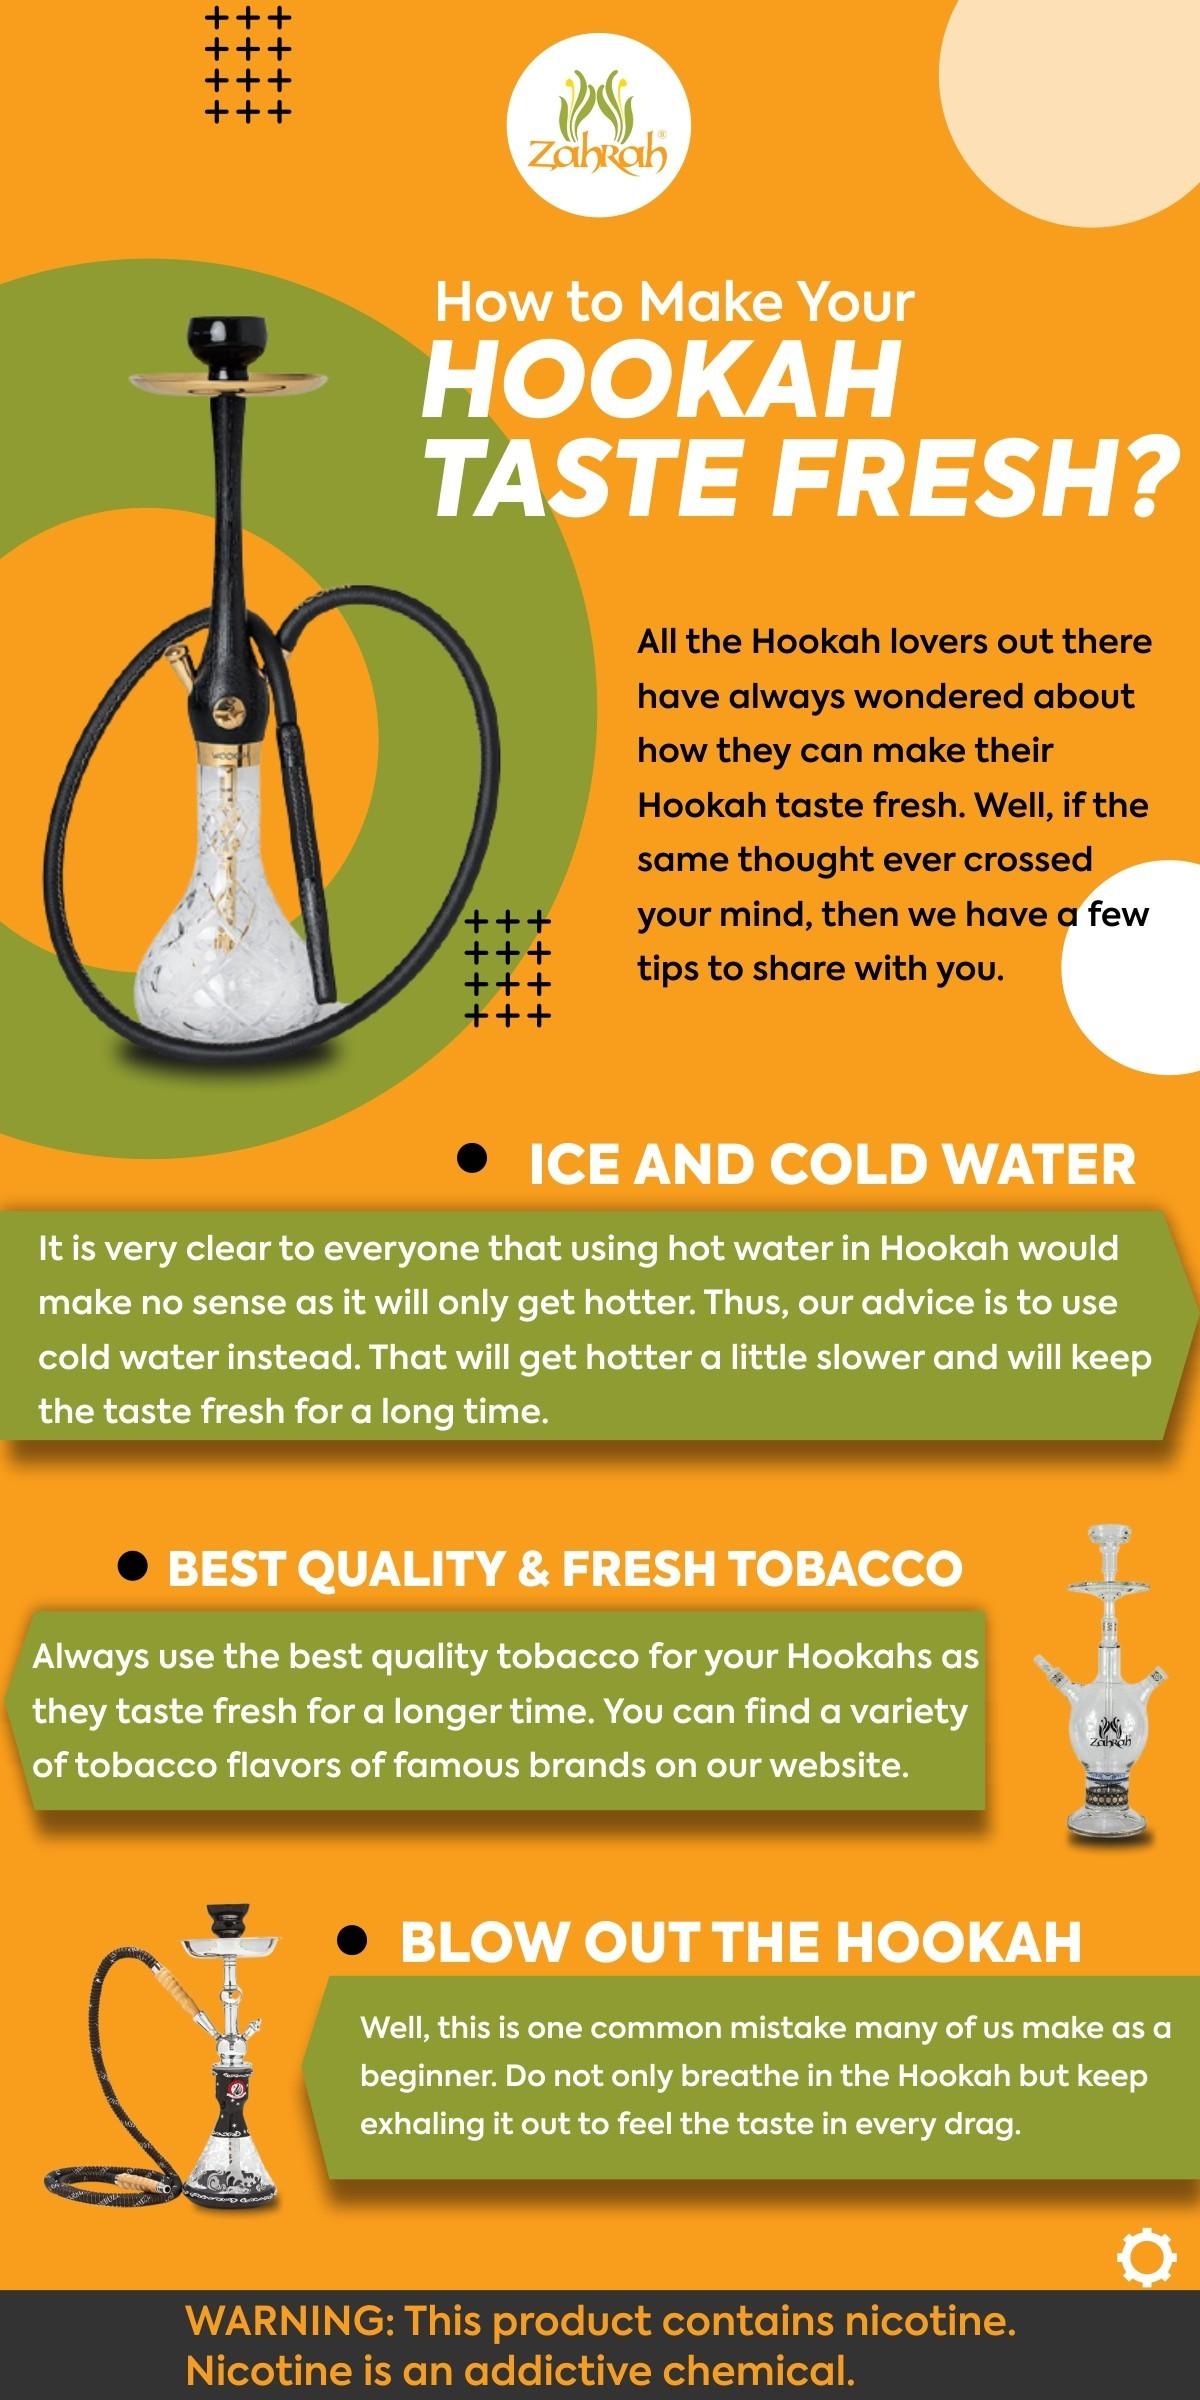 How to Make Your Hookah Taste Fresh?